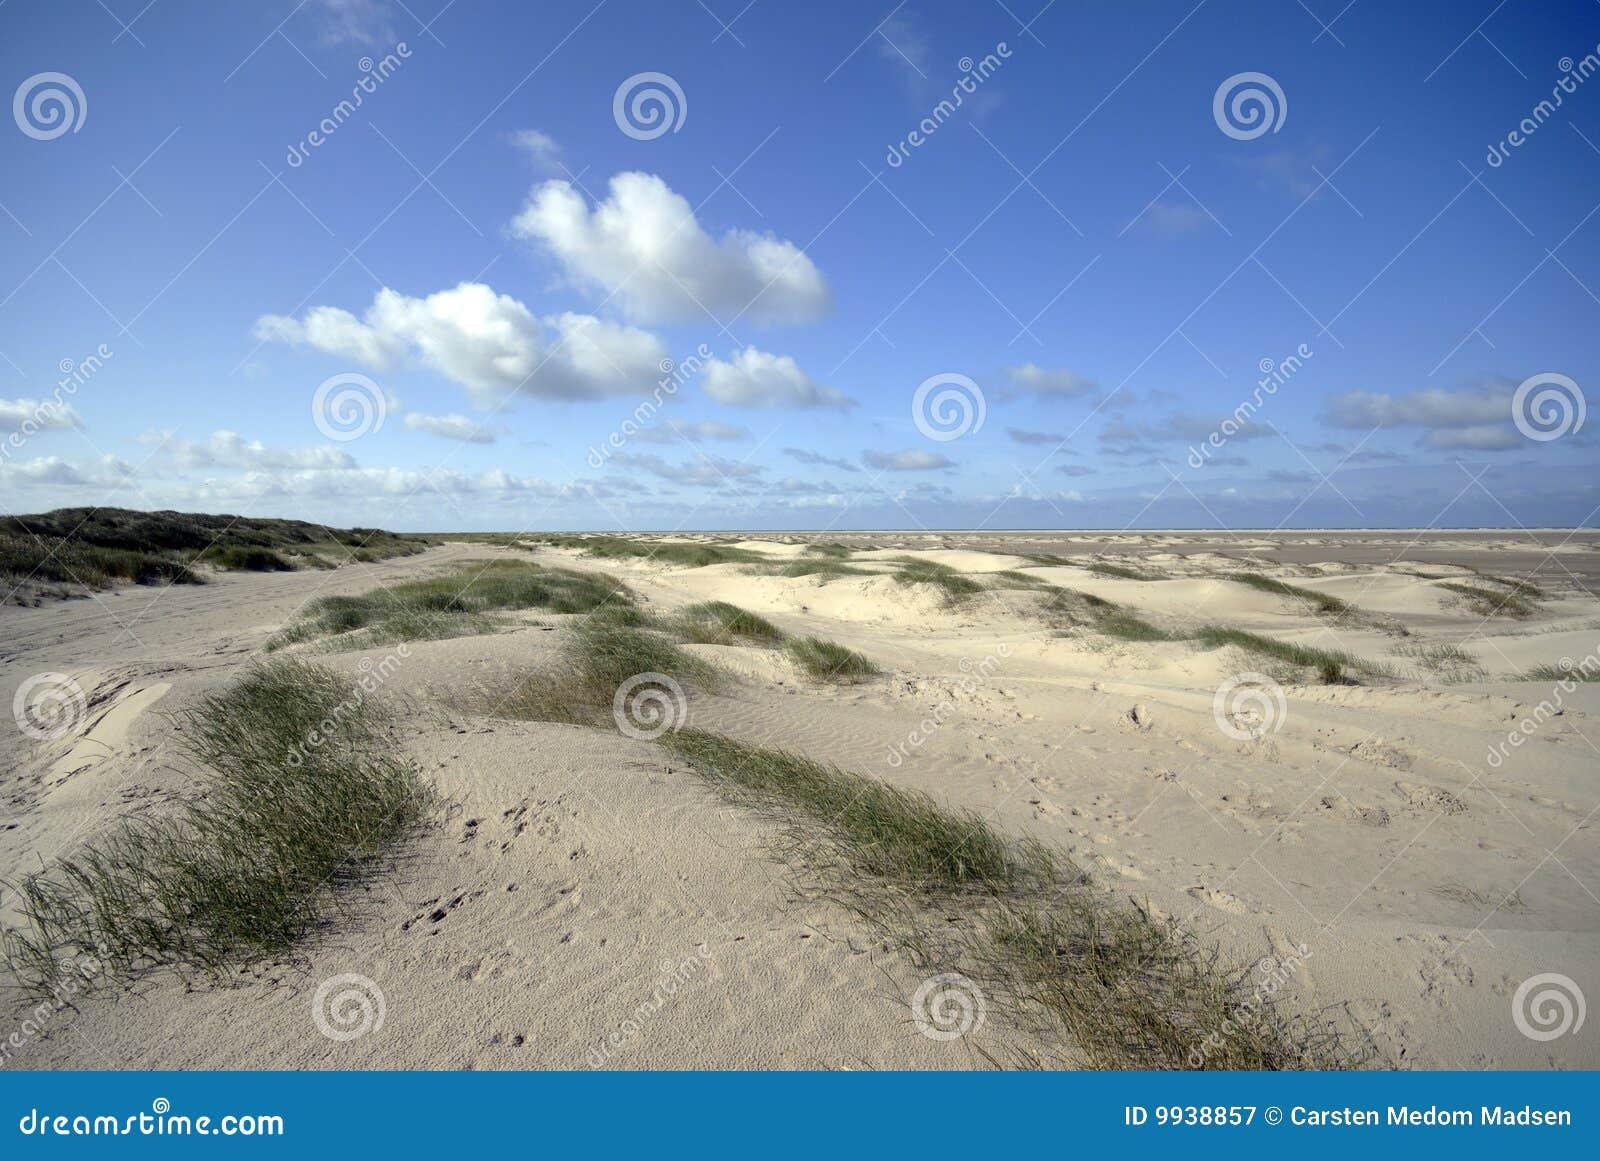 Danish Sand dunes